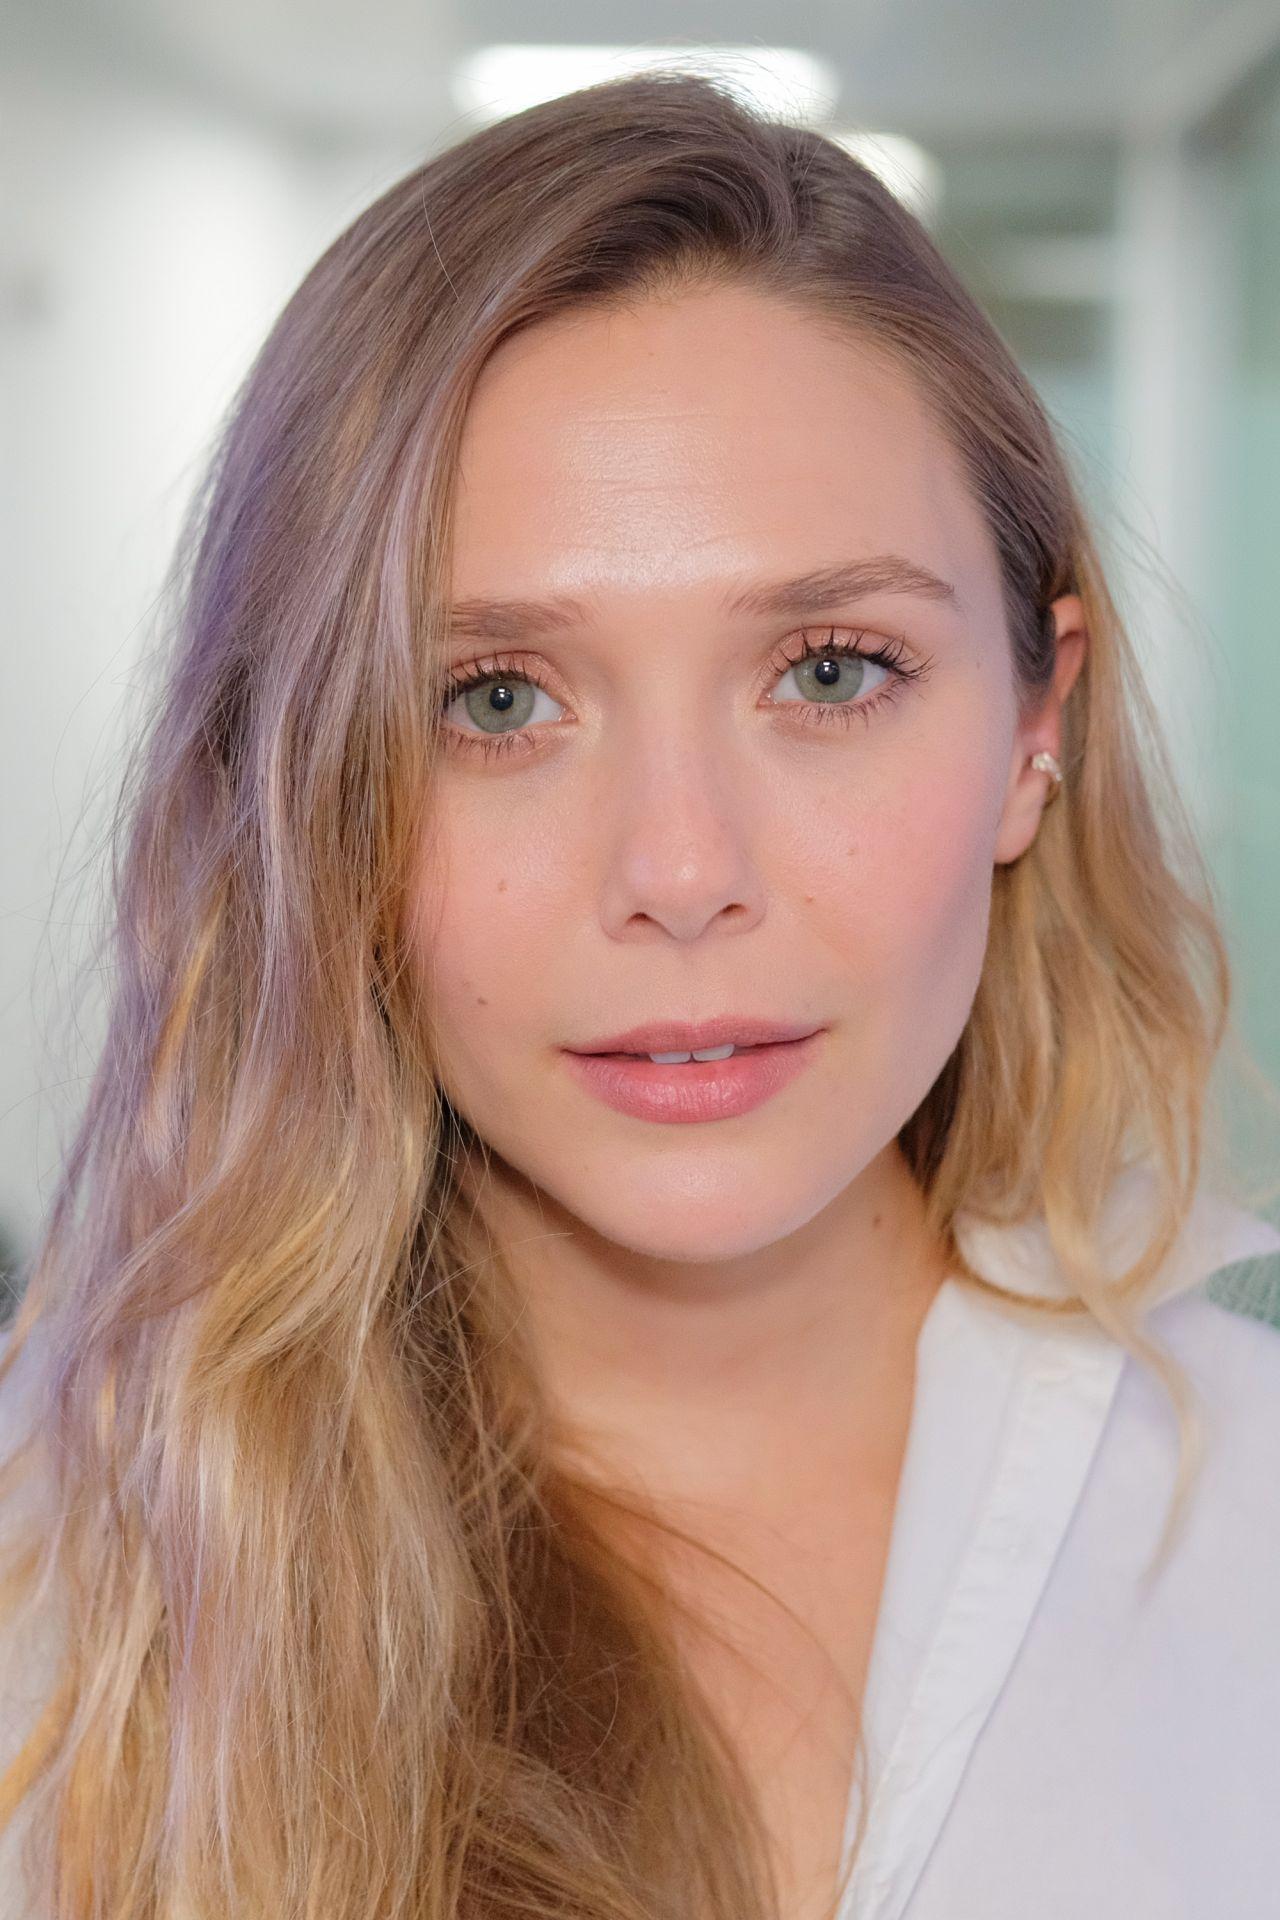 Elizabeth Olsen At Siriusxm In New York